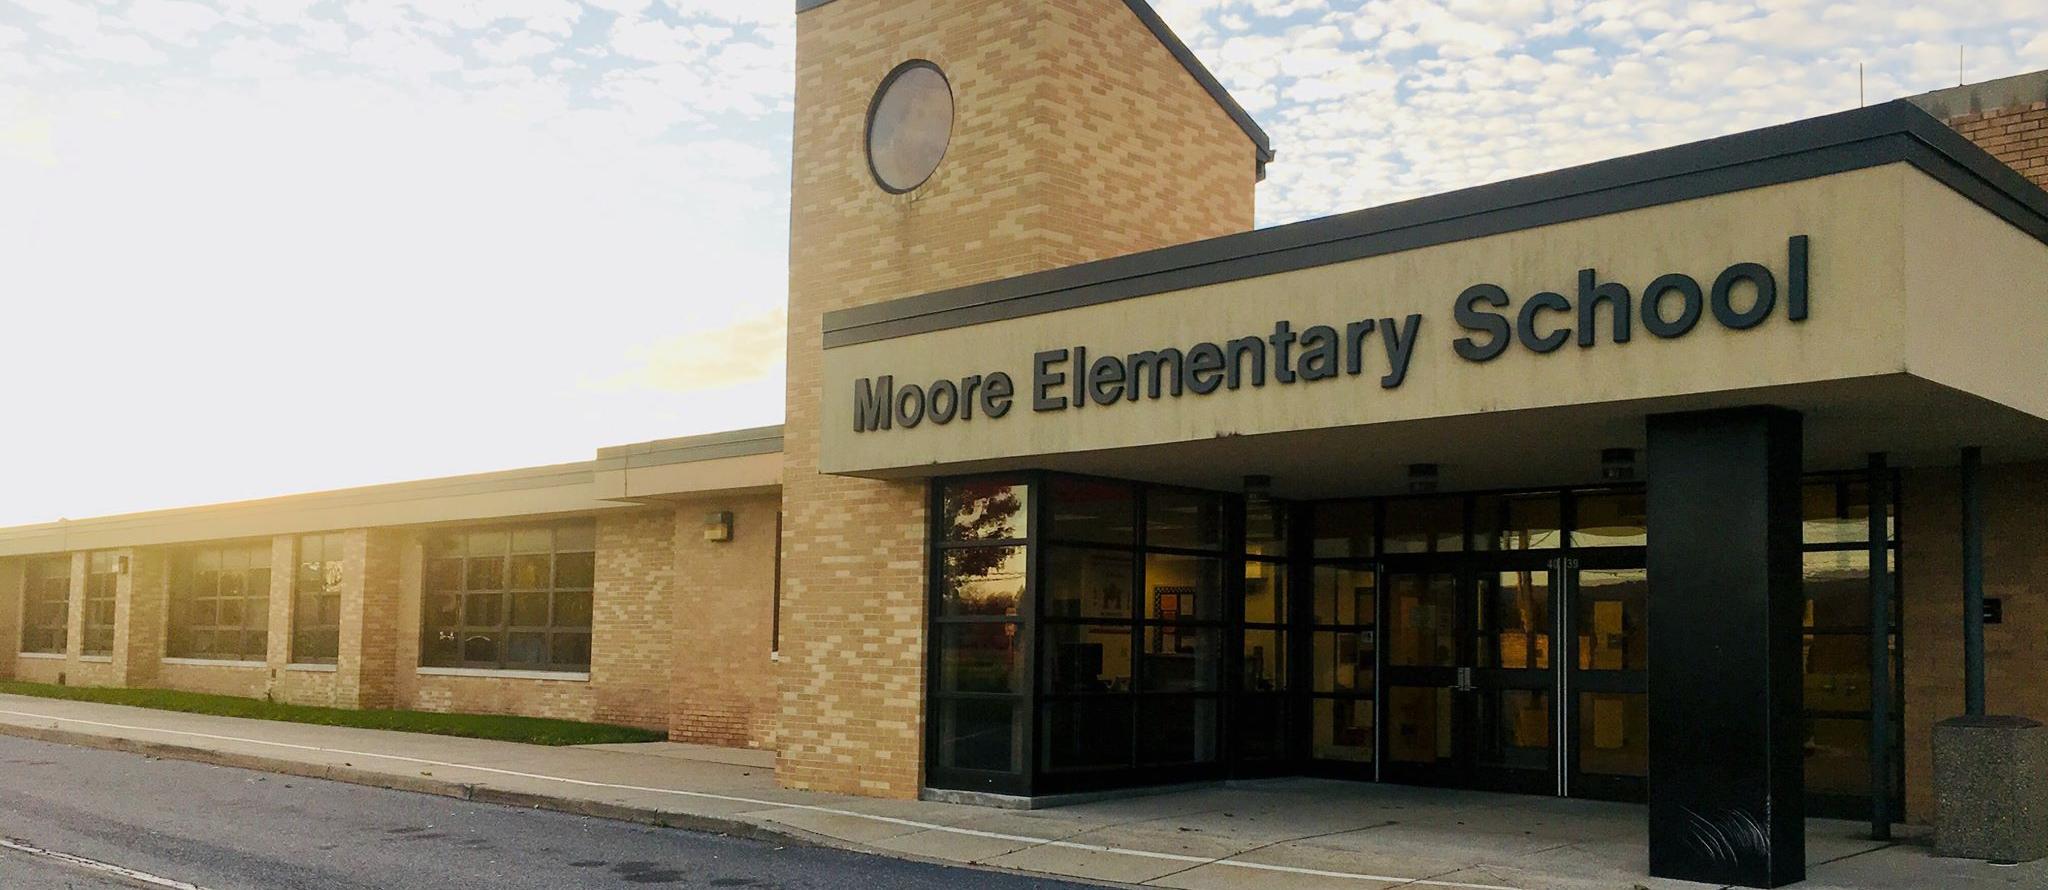 Moore Elementary School